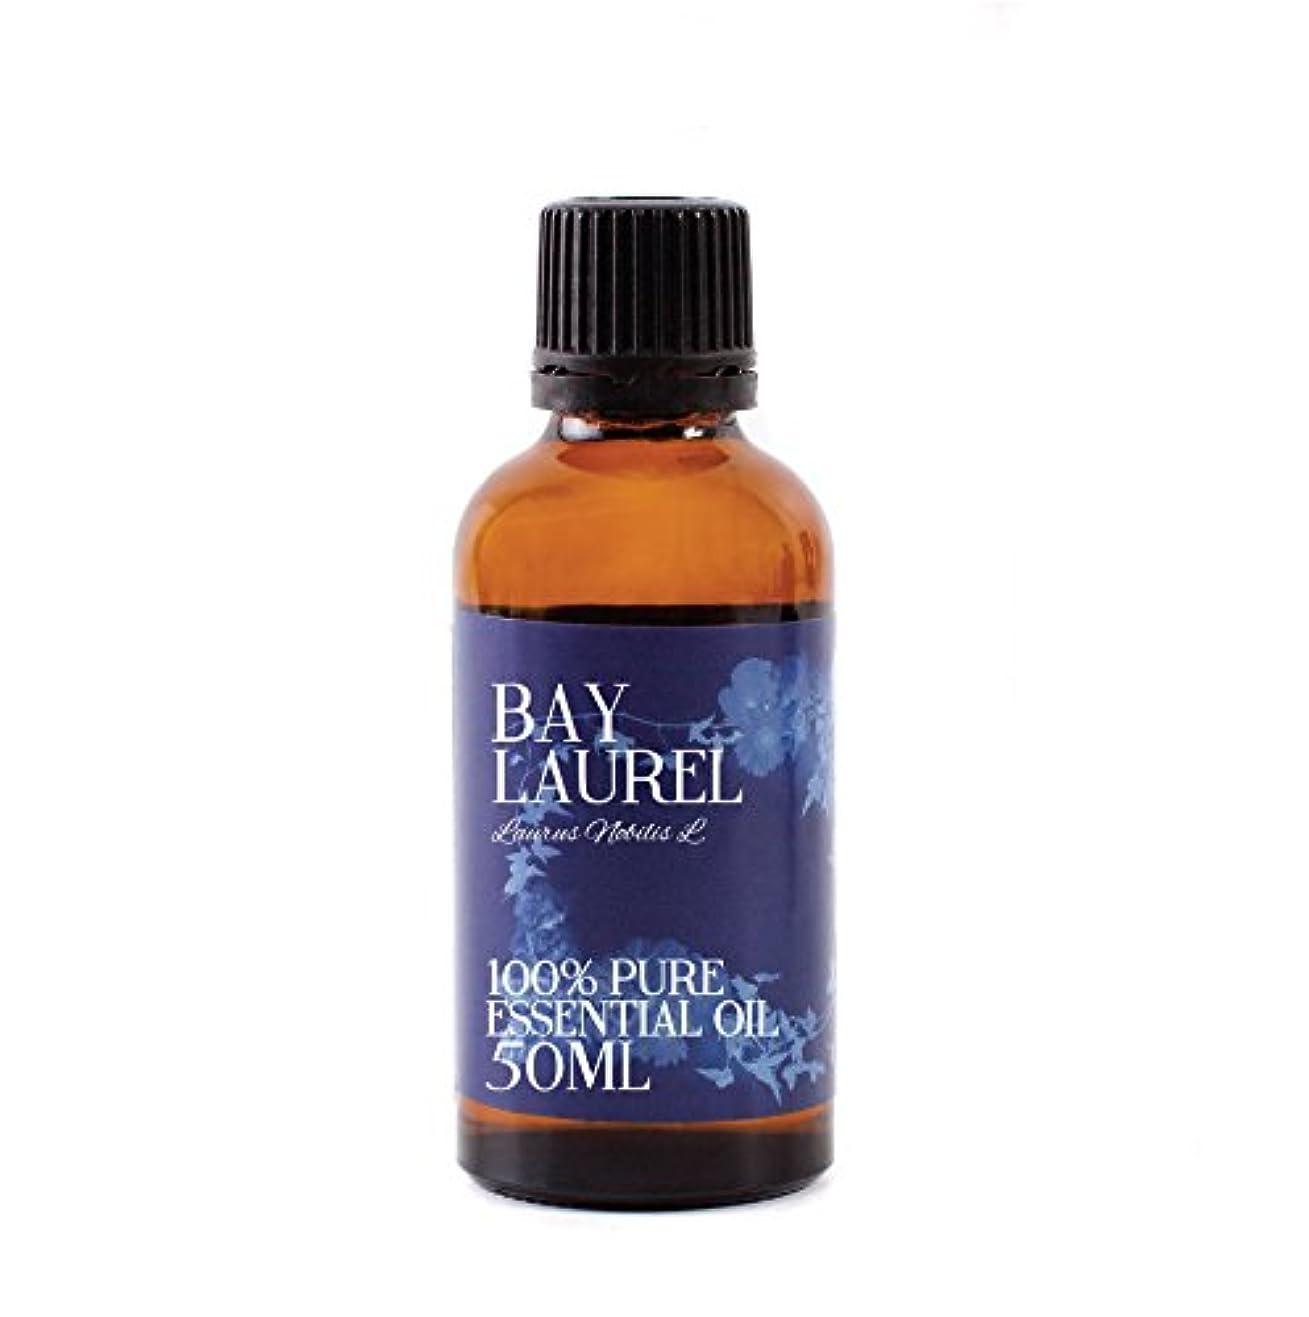 Mystic Moments | Bay Laurel Essential Oil - 50ml - 100% Pure